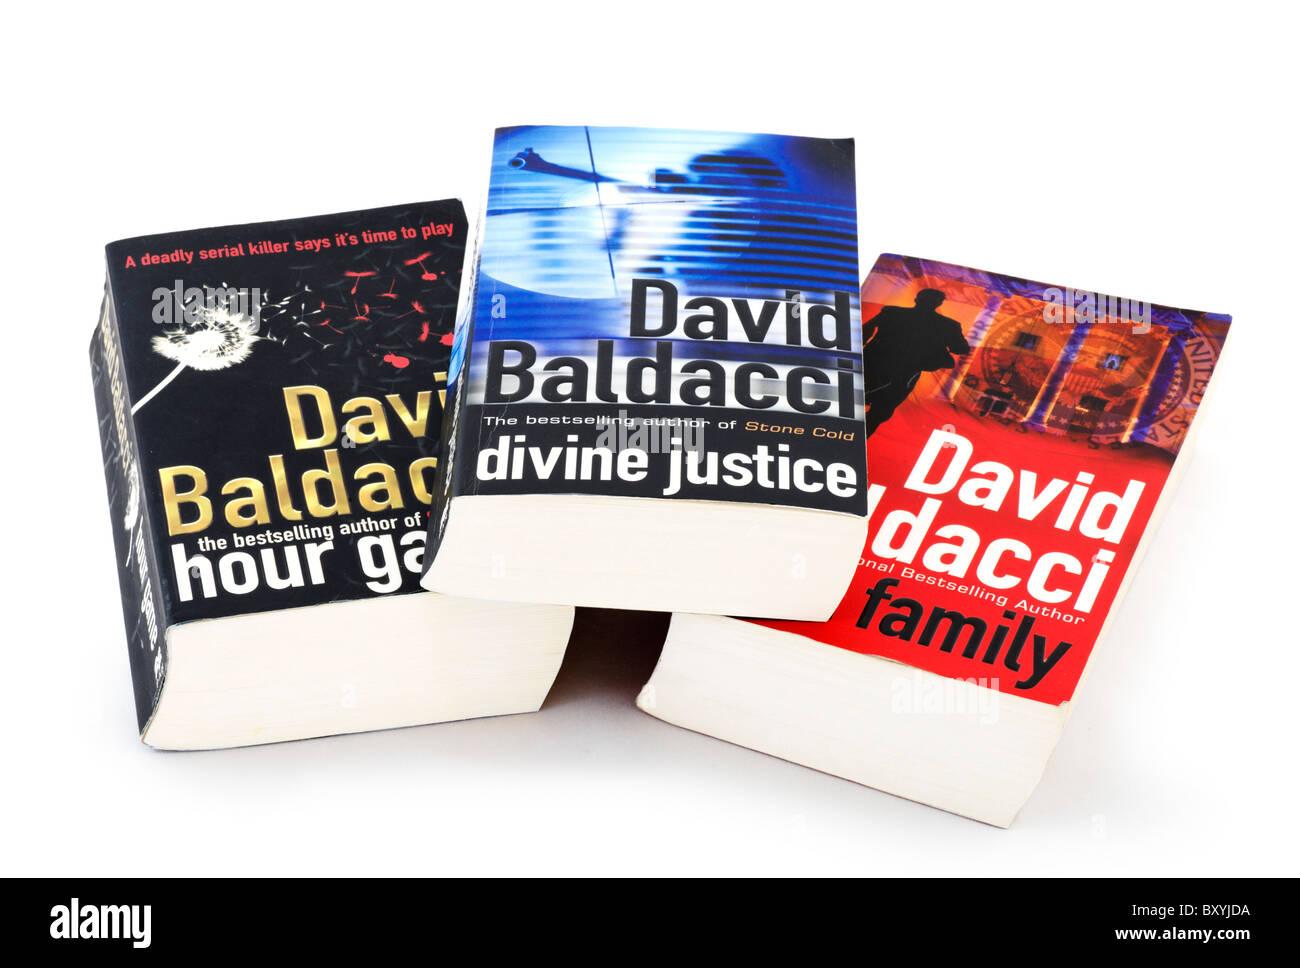 Best selling paperback books by David Baldacci, UK - Stock Image